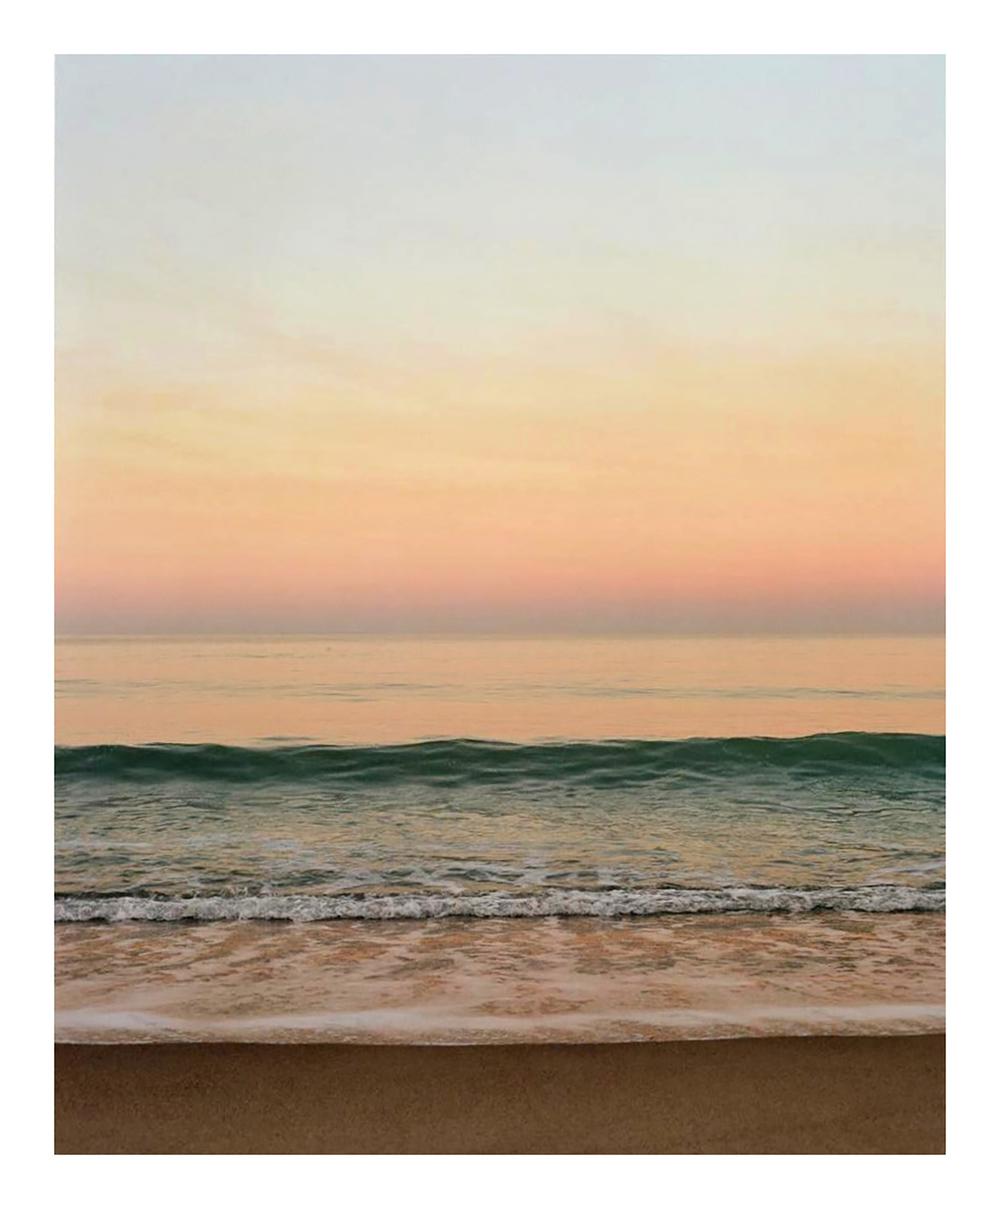 A San Clemente, CA Sunrise